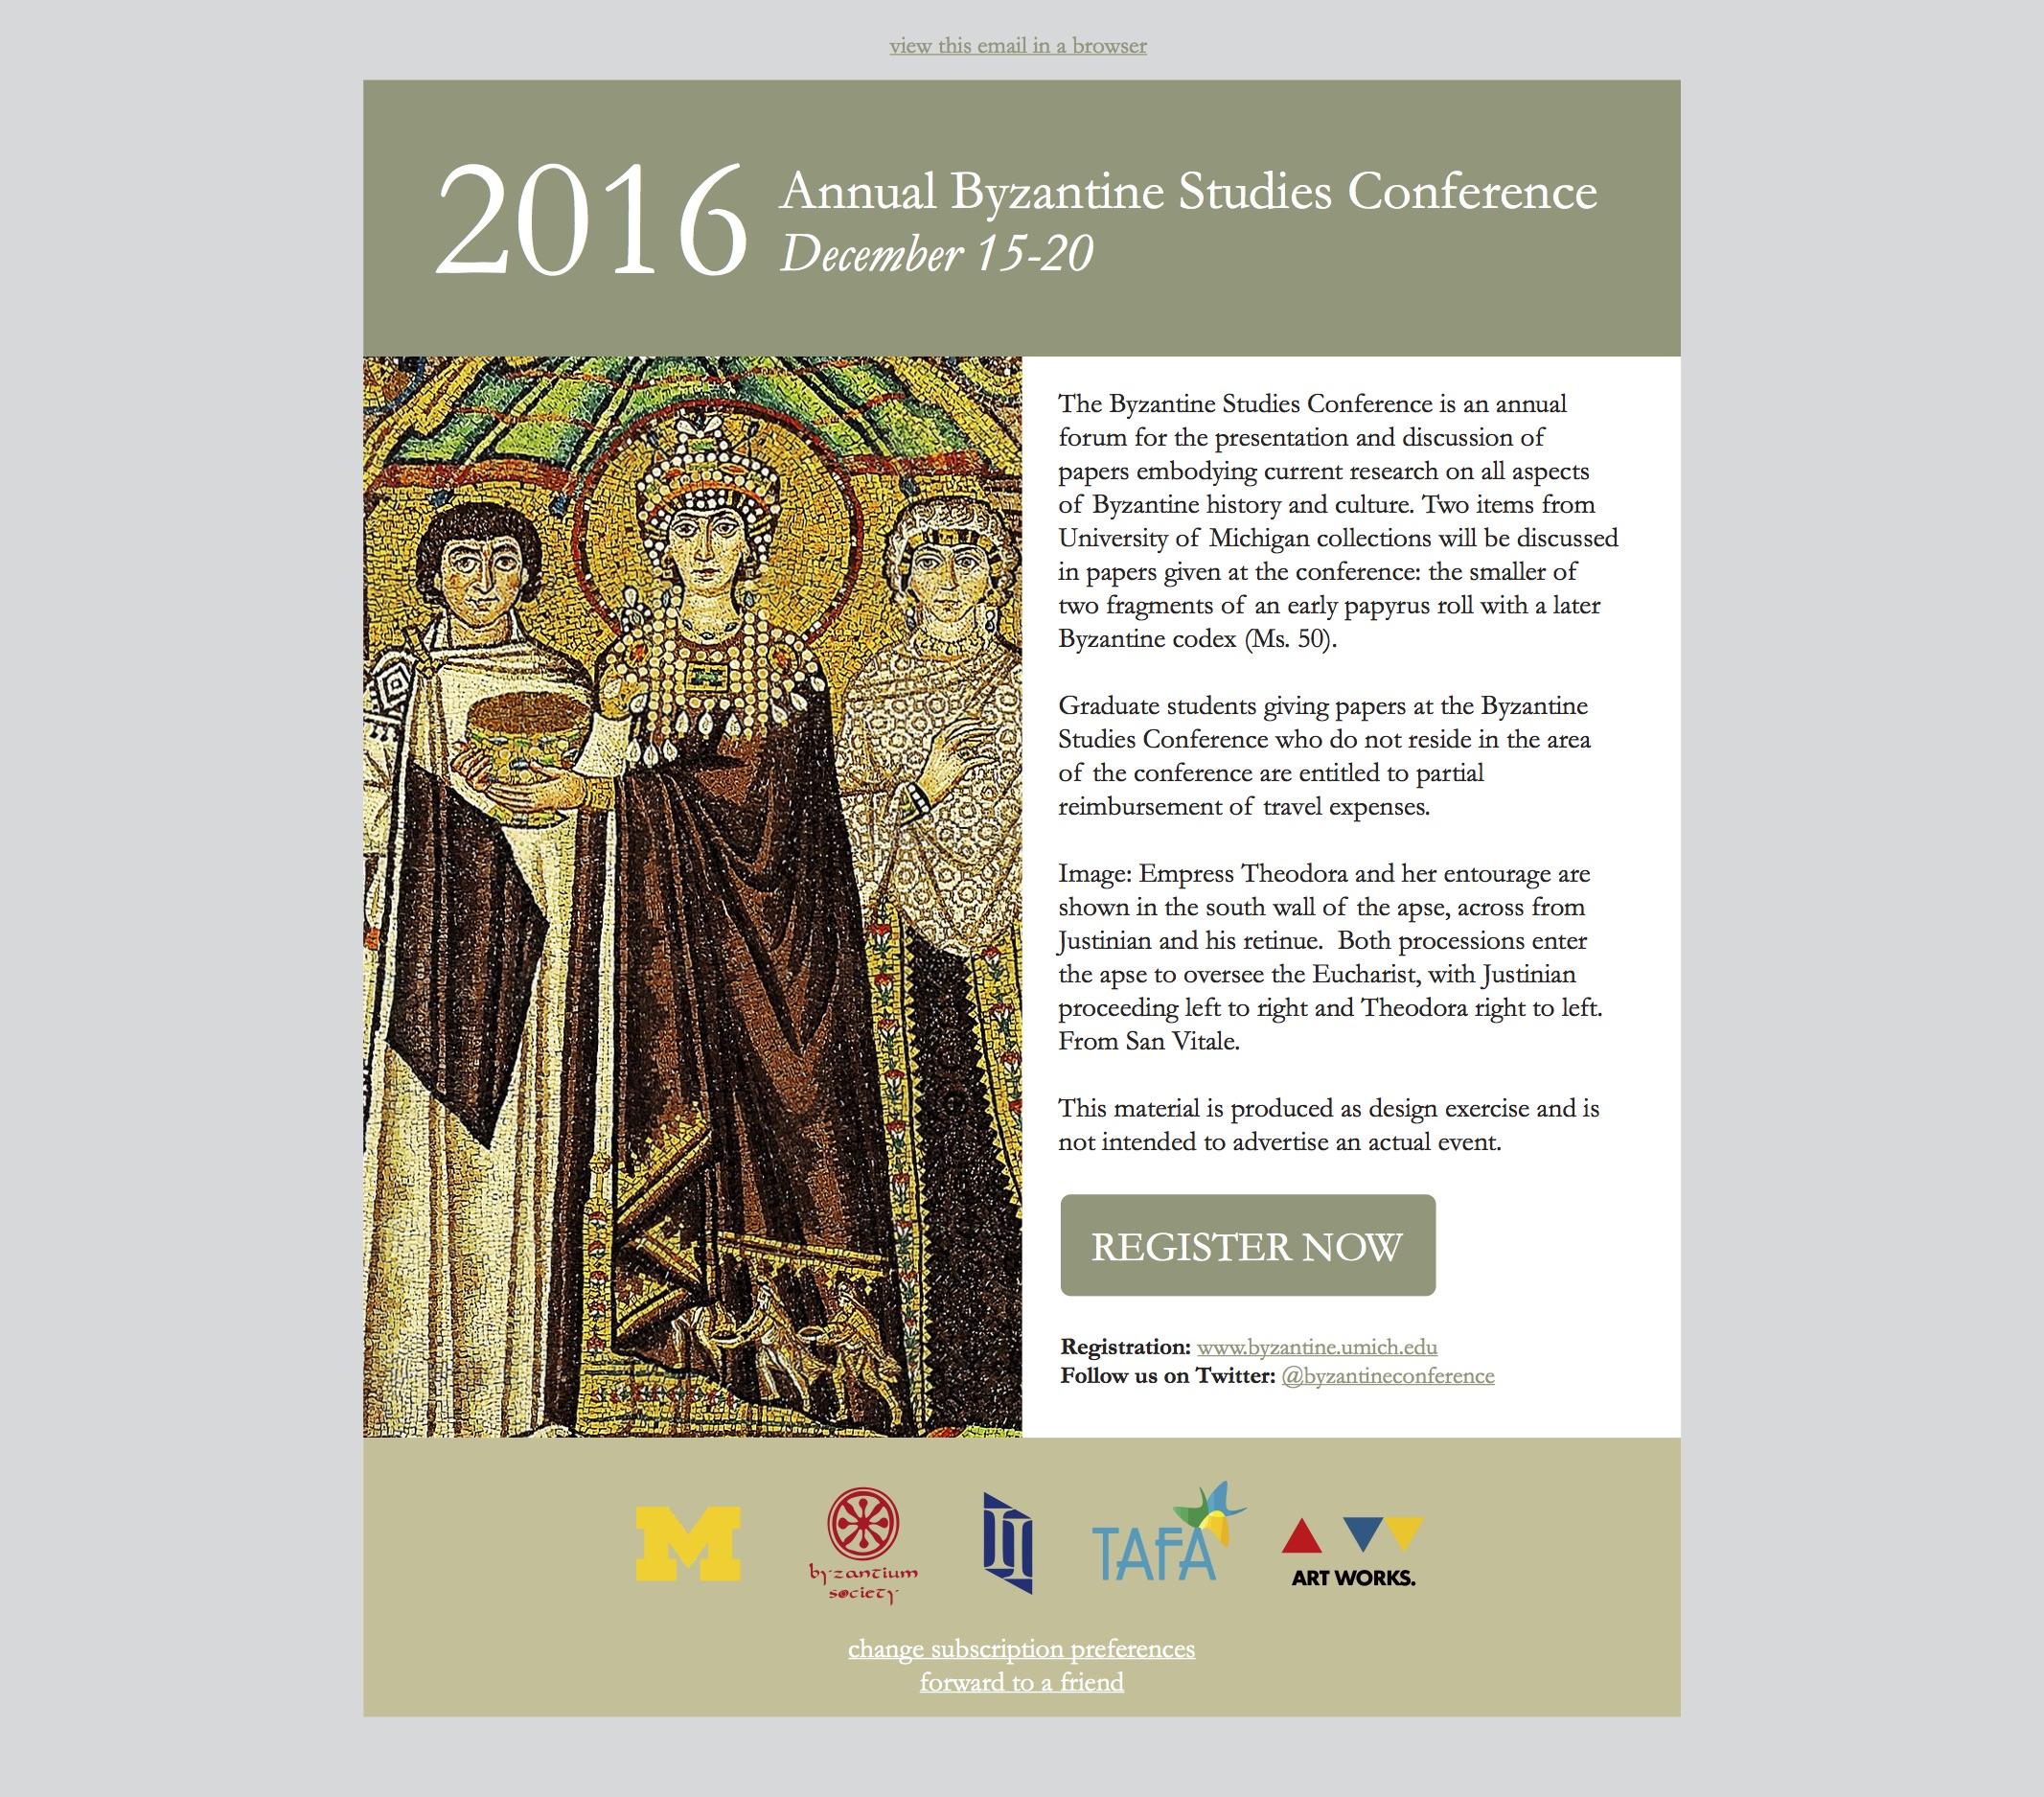 Conference invitation email design